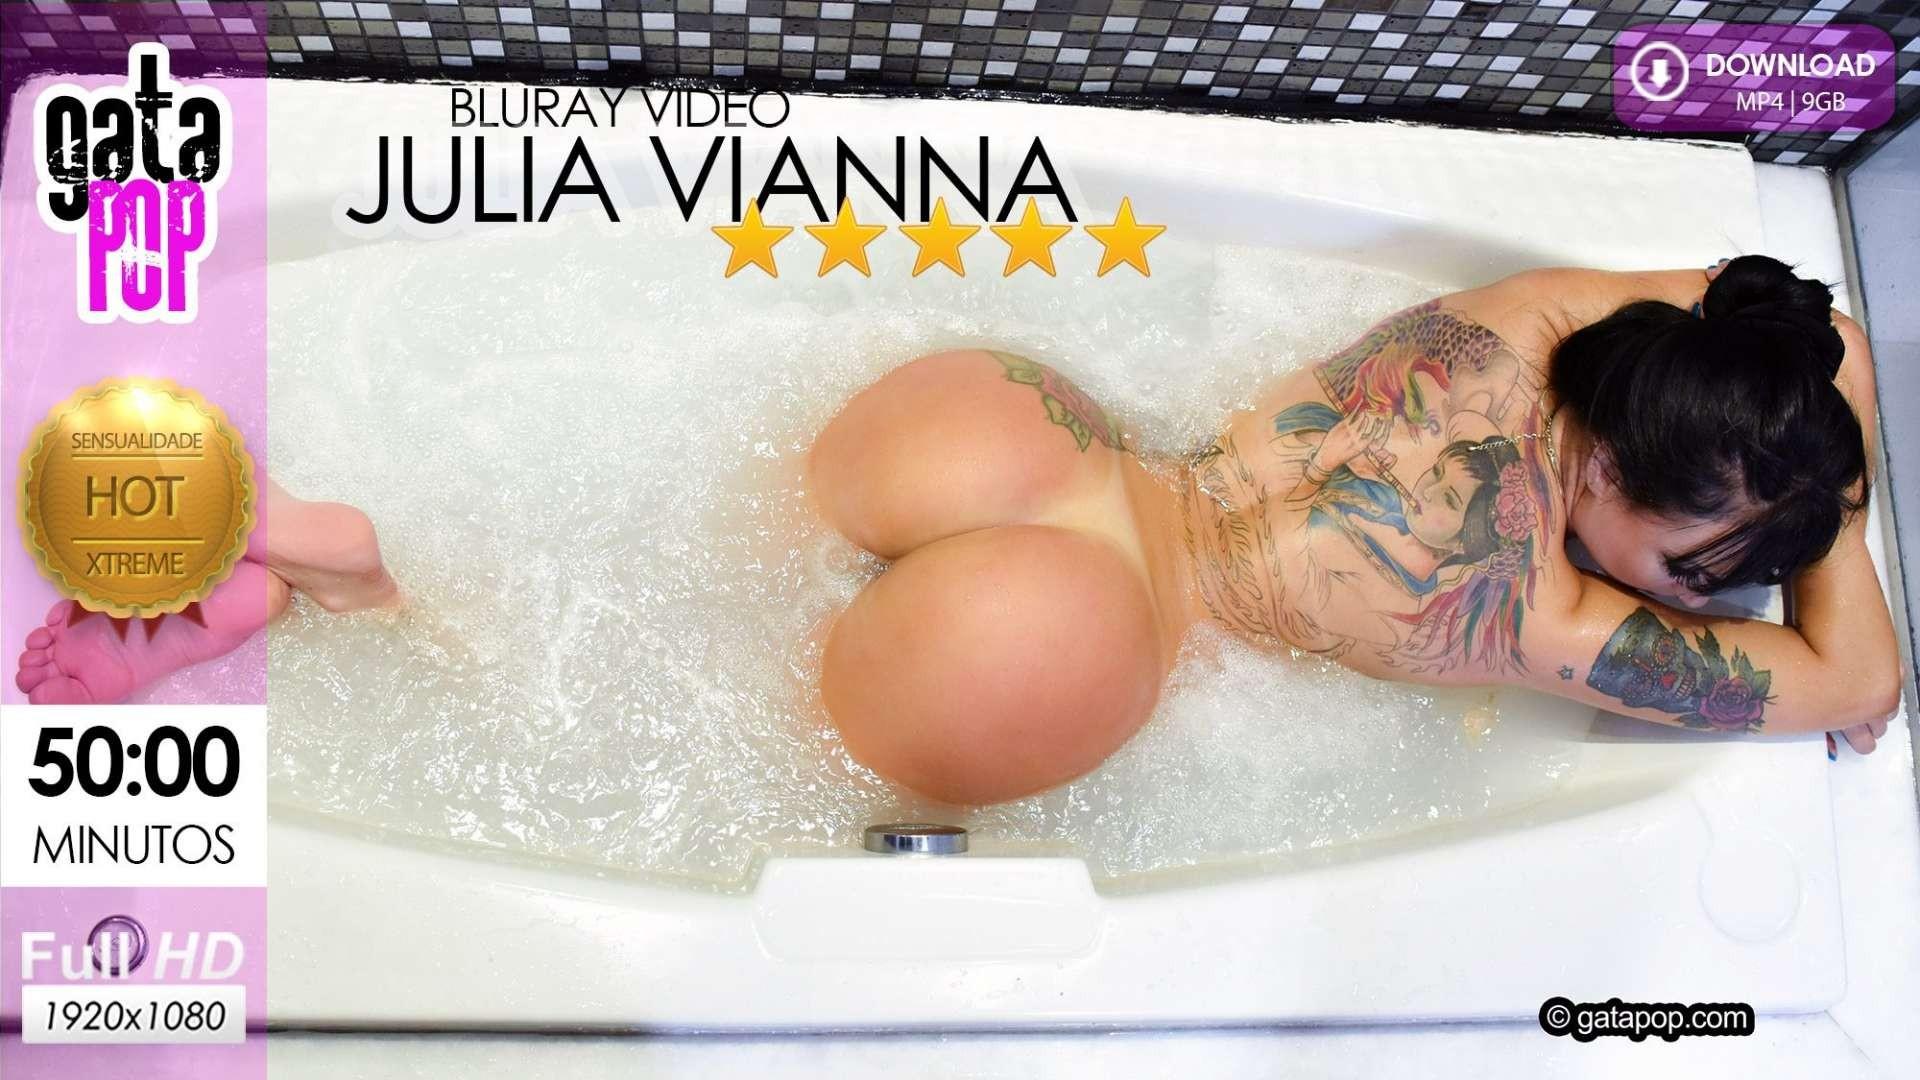 Julia Vianna - Bluray